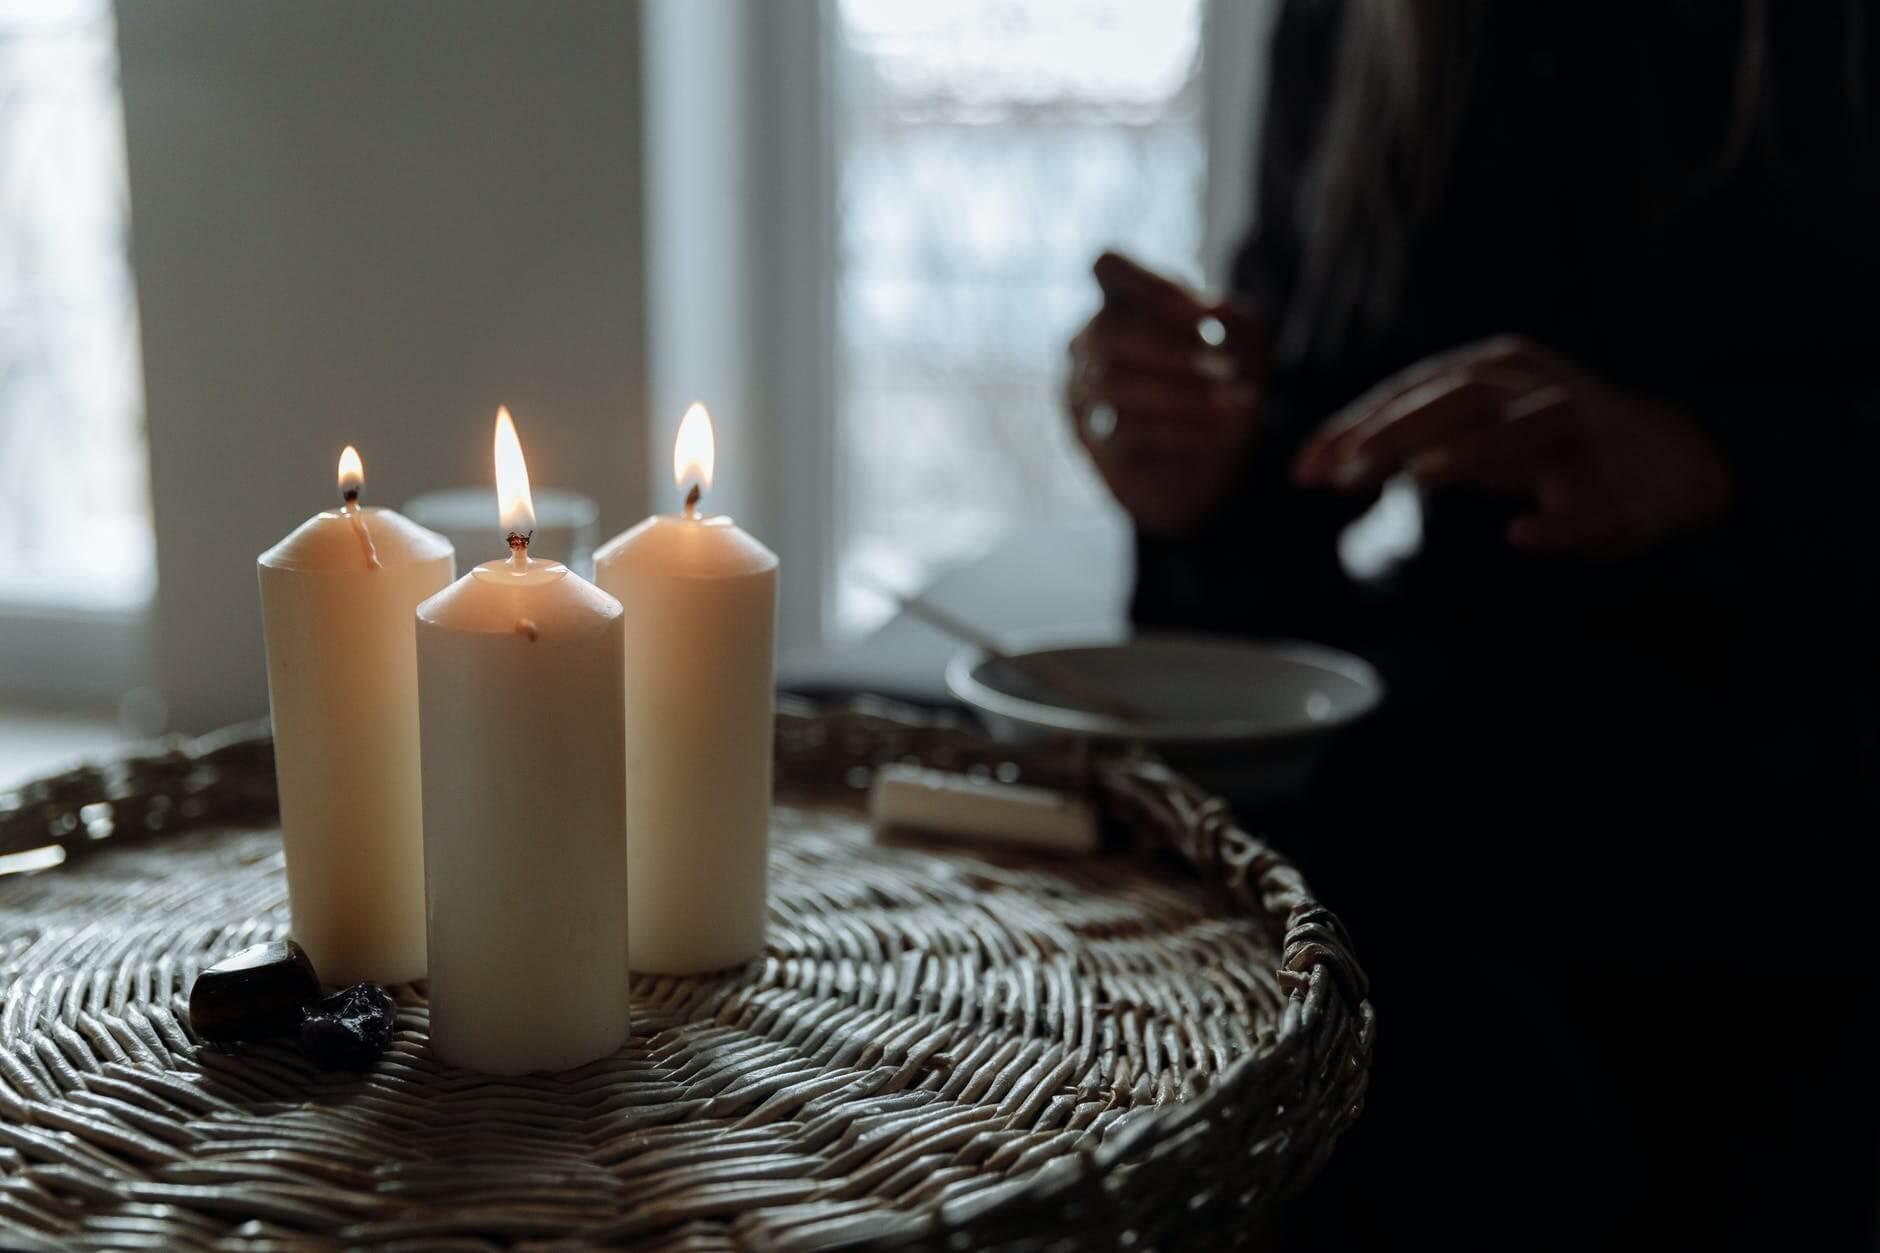 white pillar candles on brown woven basket